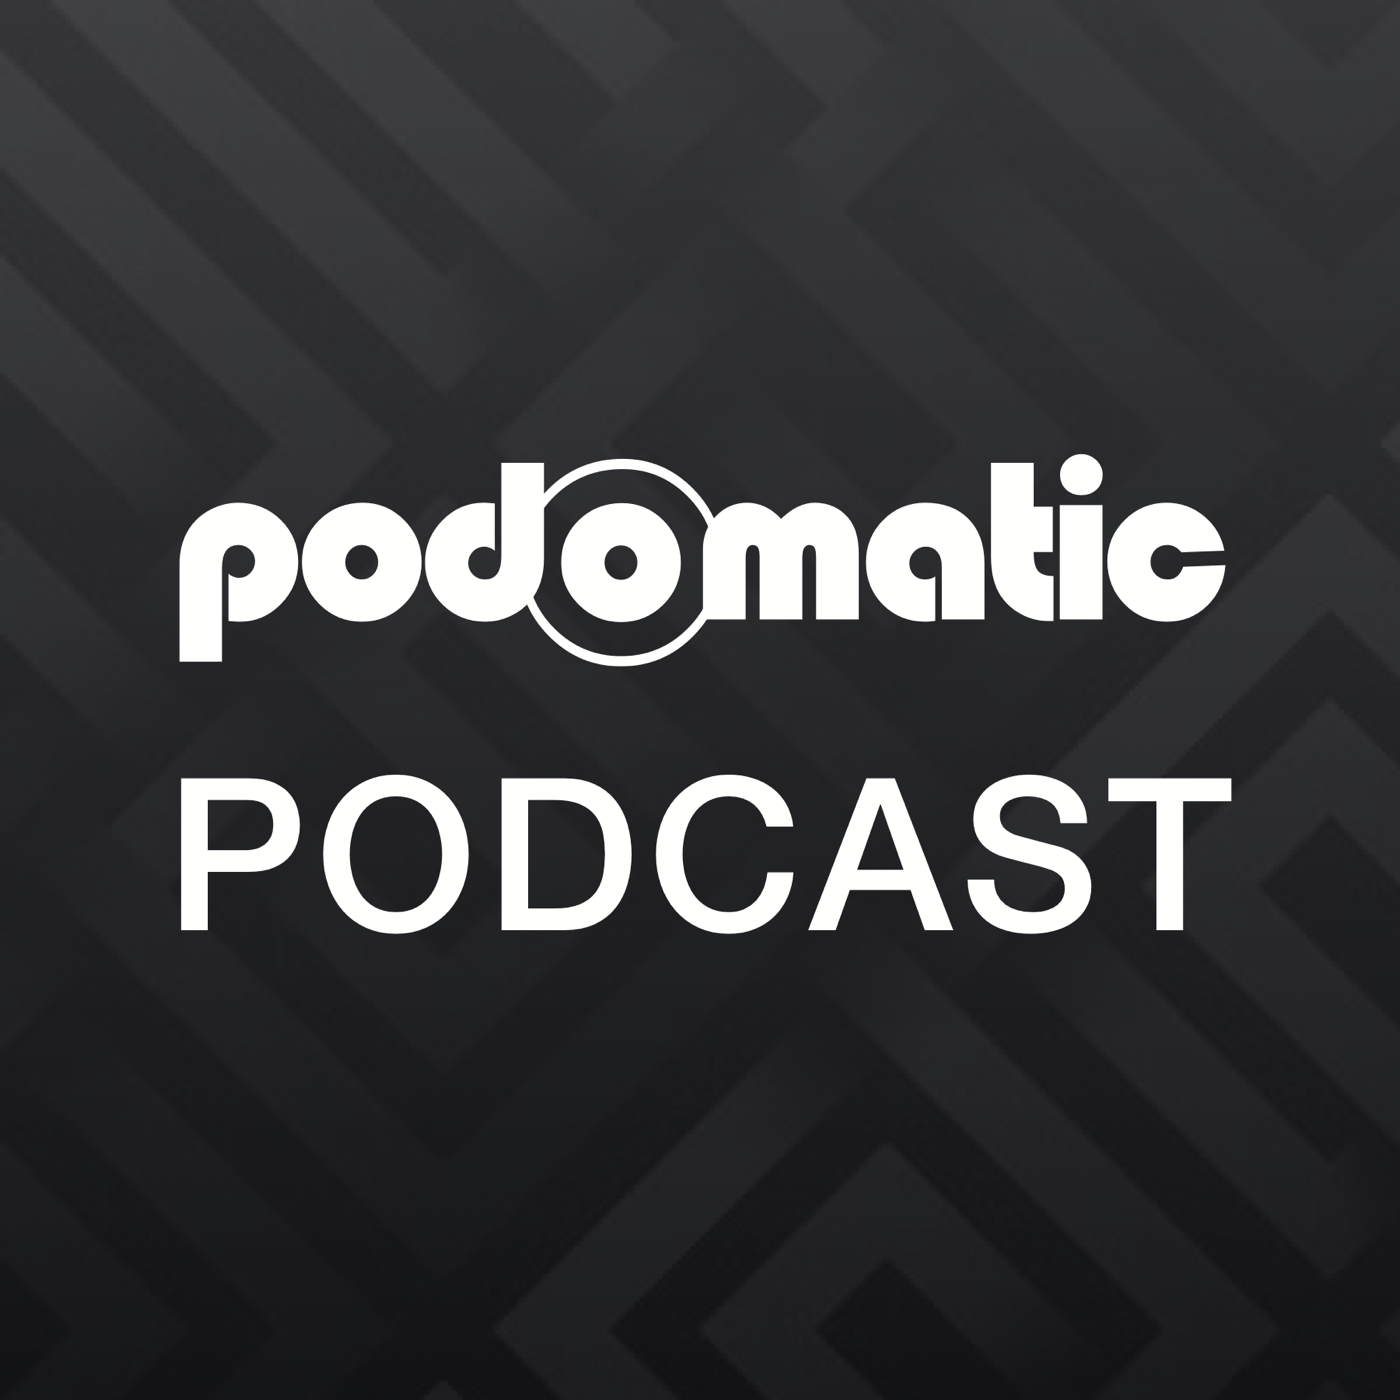 daniel bowman's Podcast